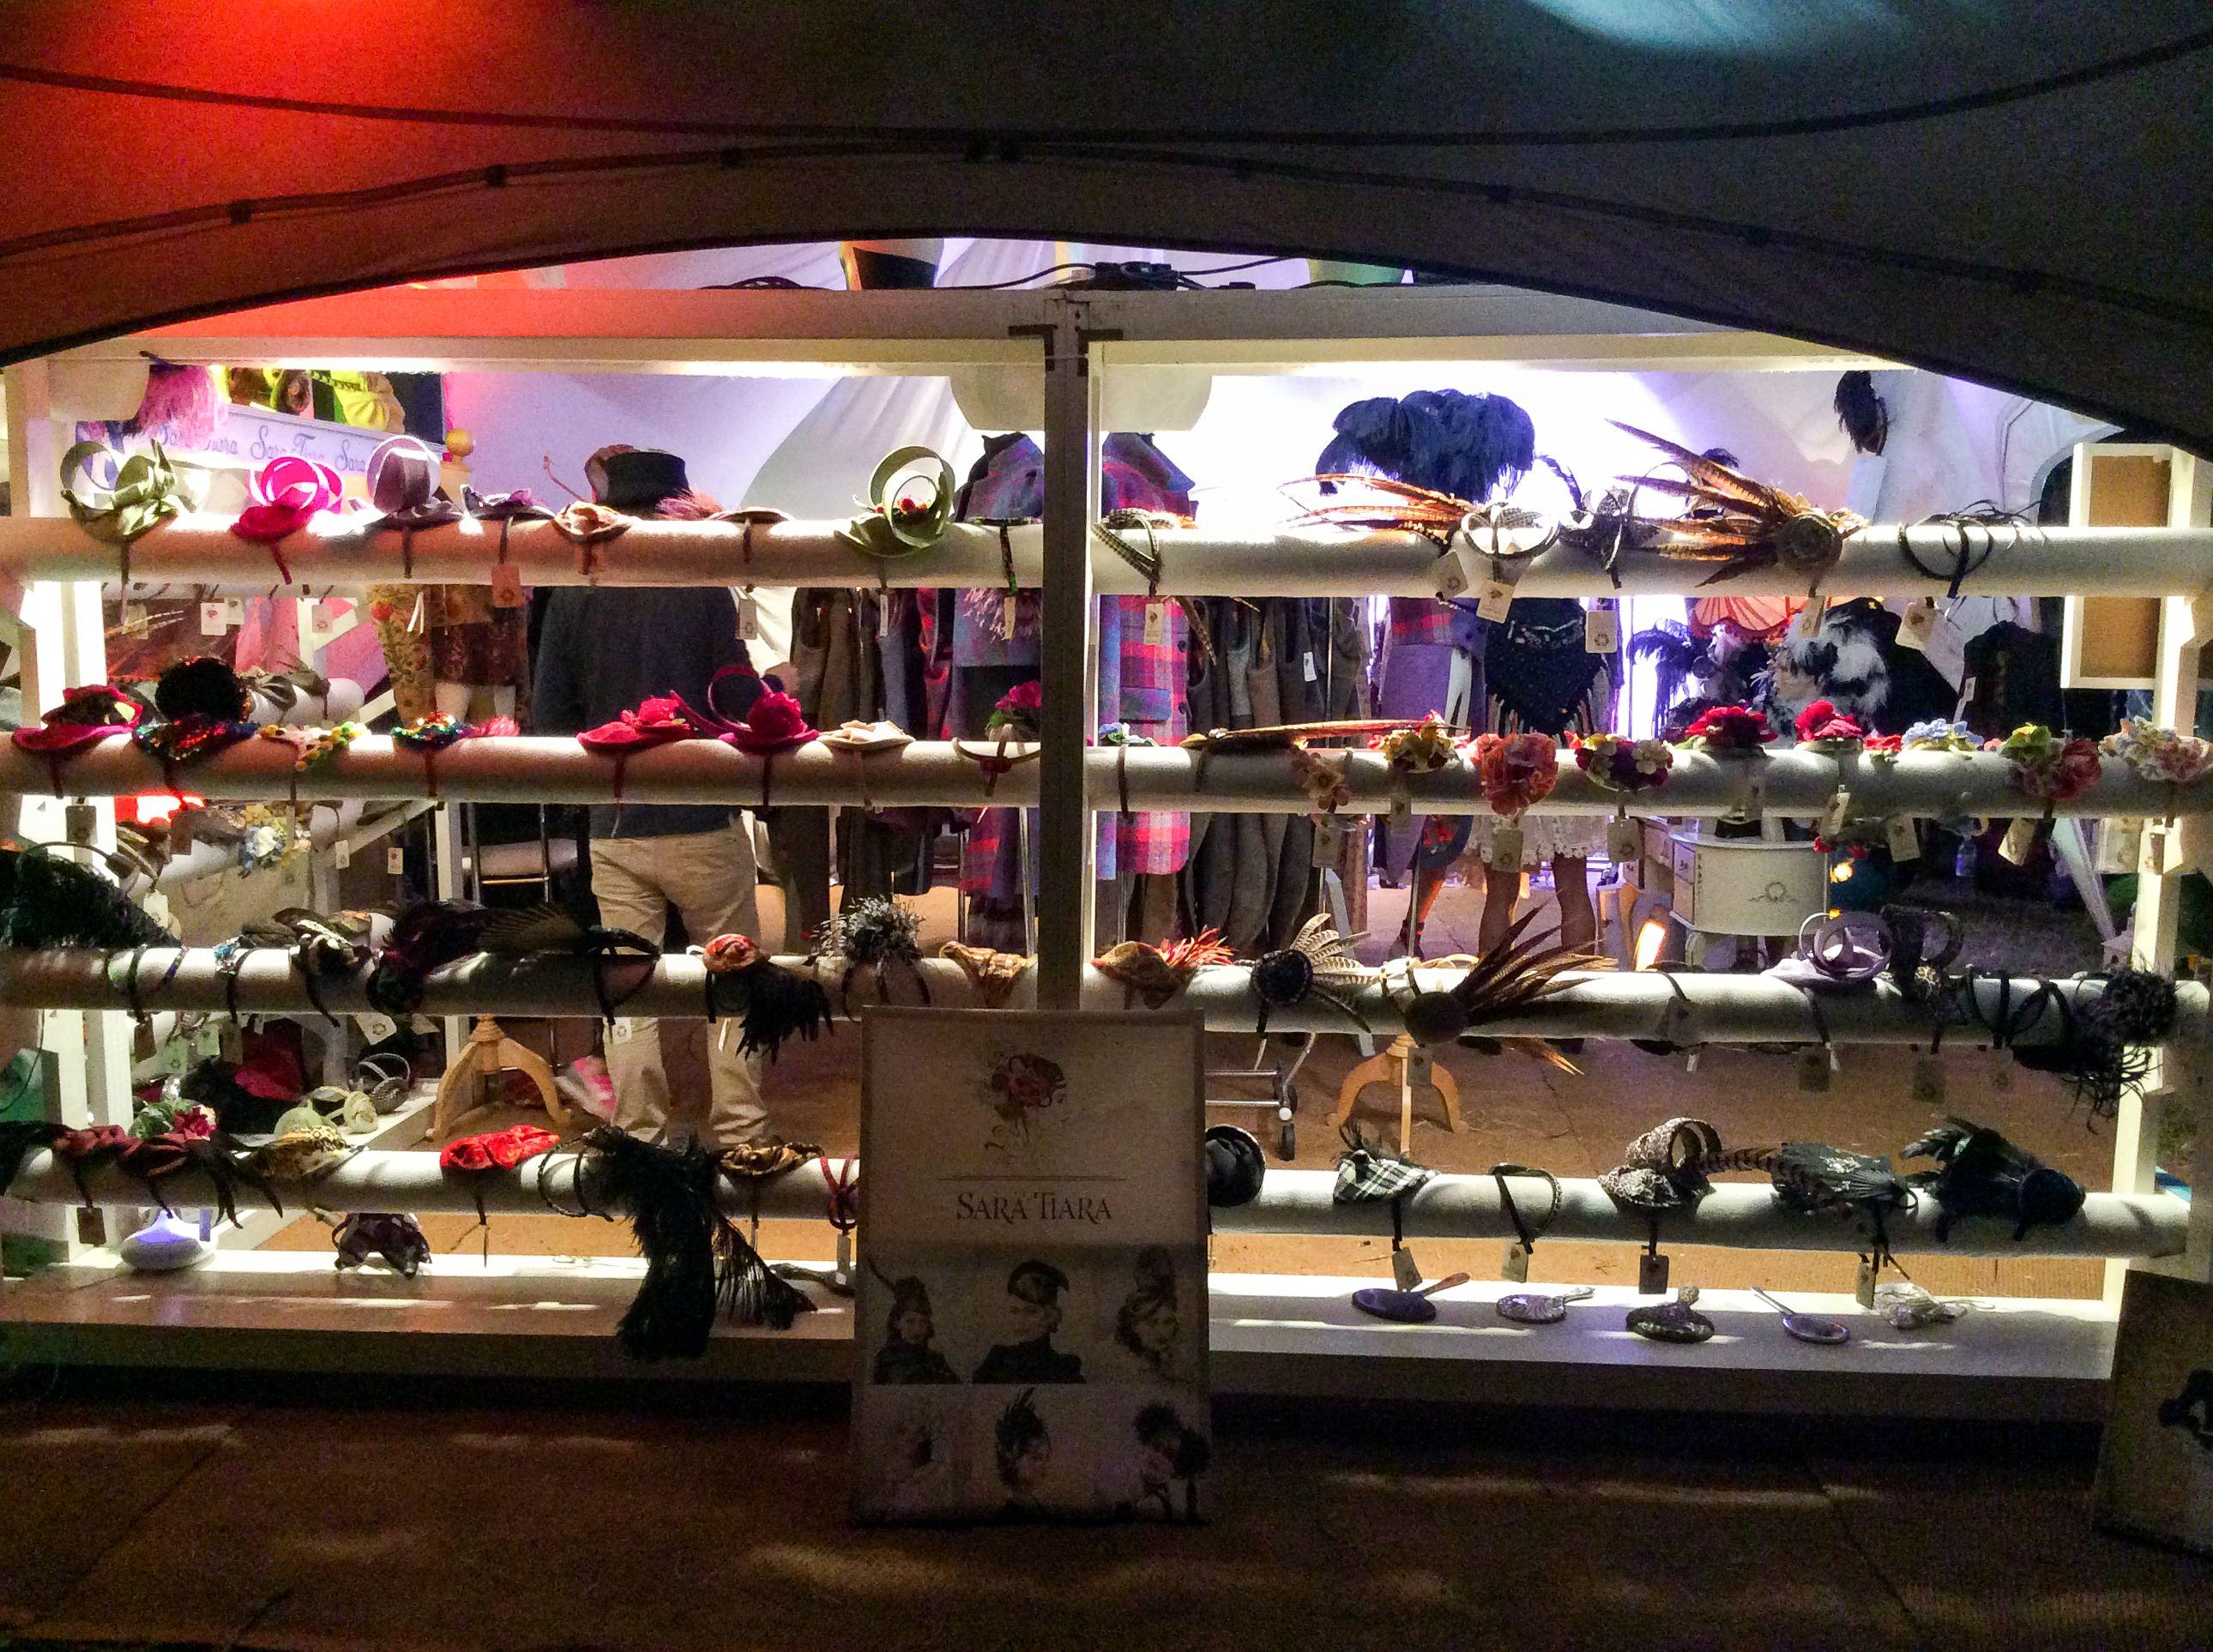 #BehindTheScenes #SaraTiara #WildernessFestival #WildernessFestival2015 #FestivalHeadwear #FestivalHeaddress #FestivalsUK